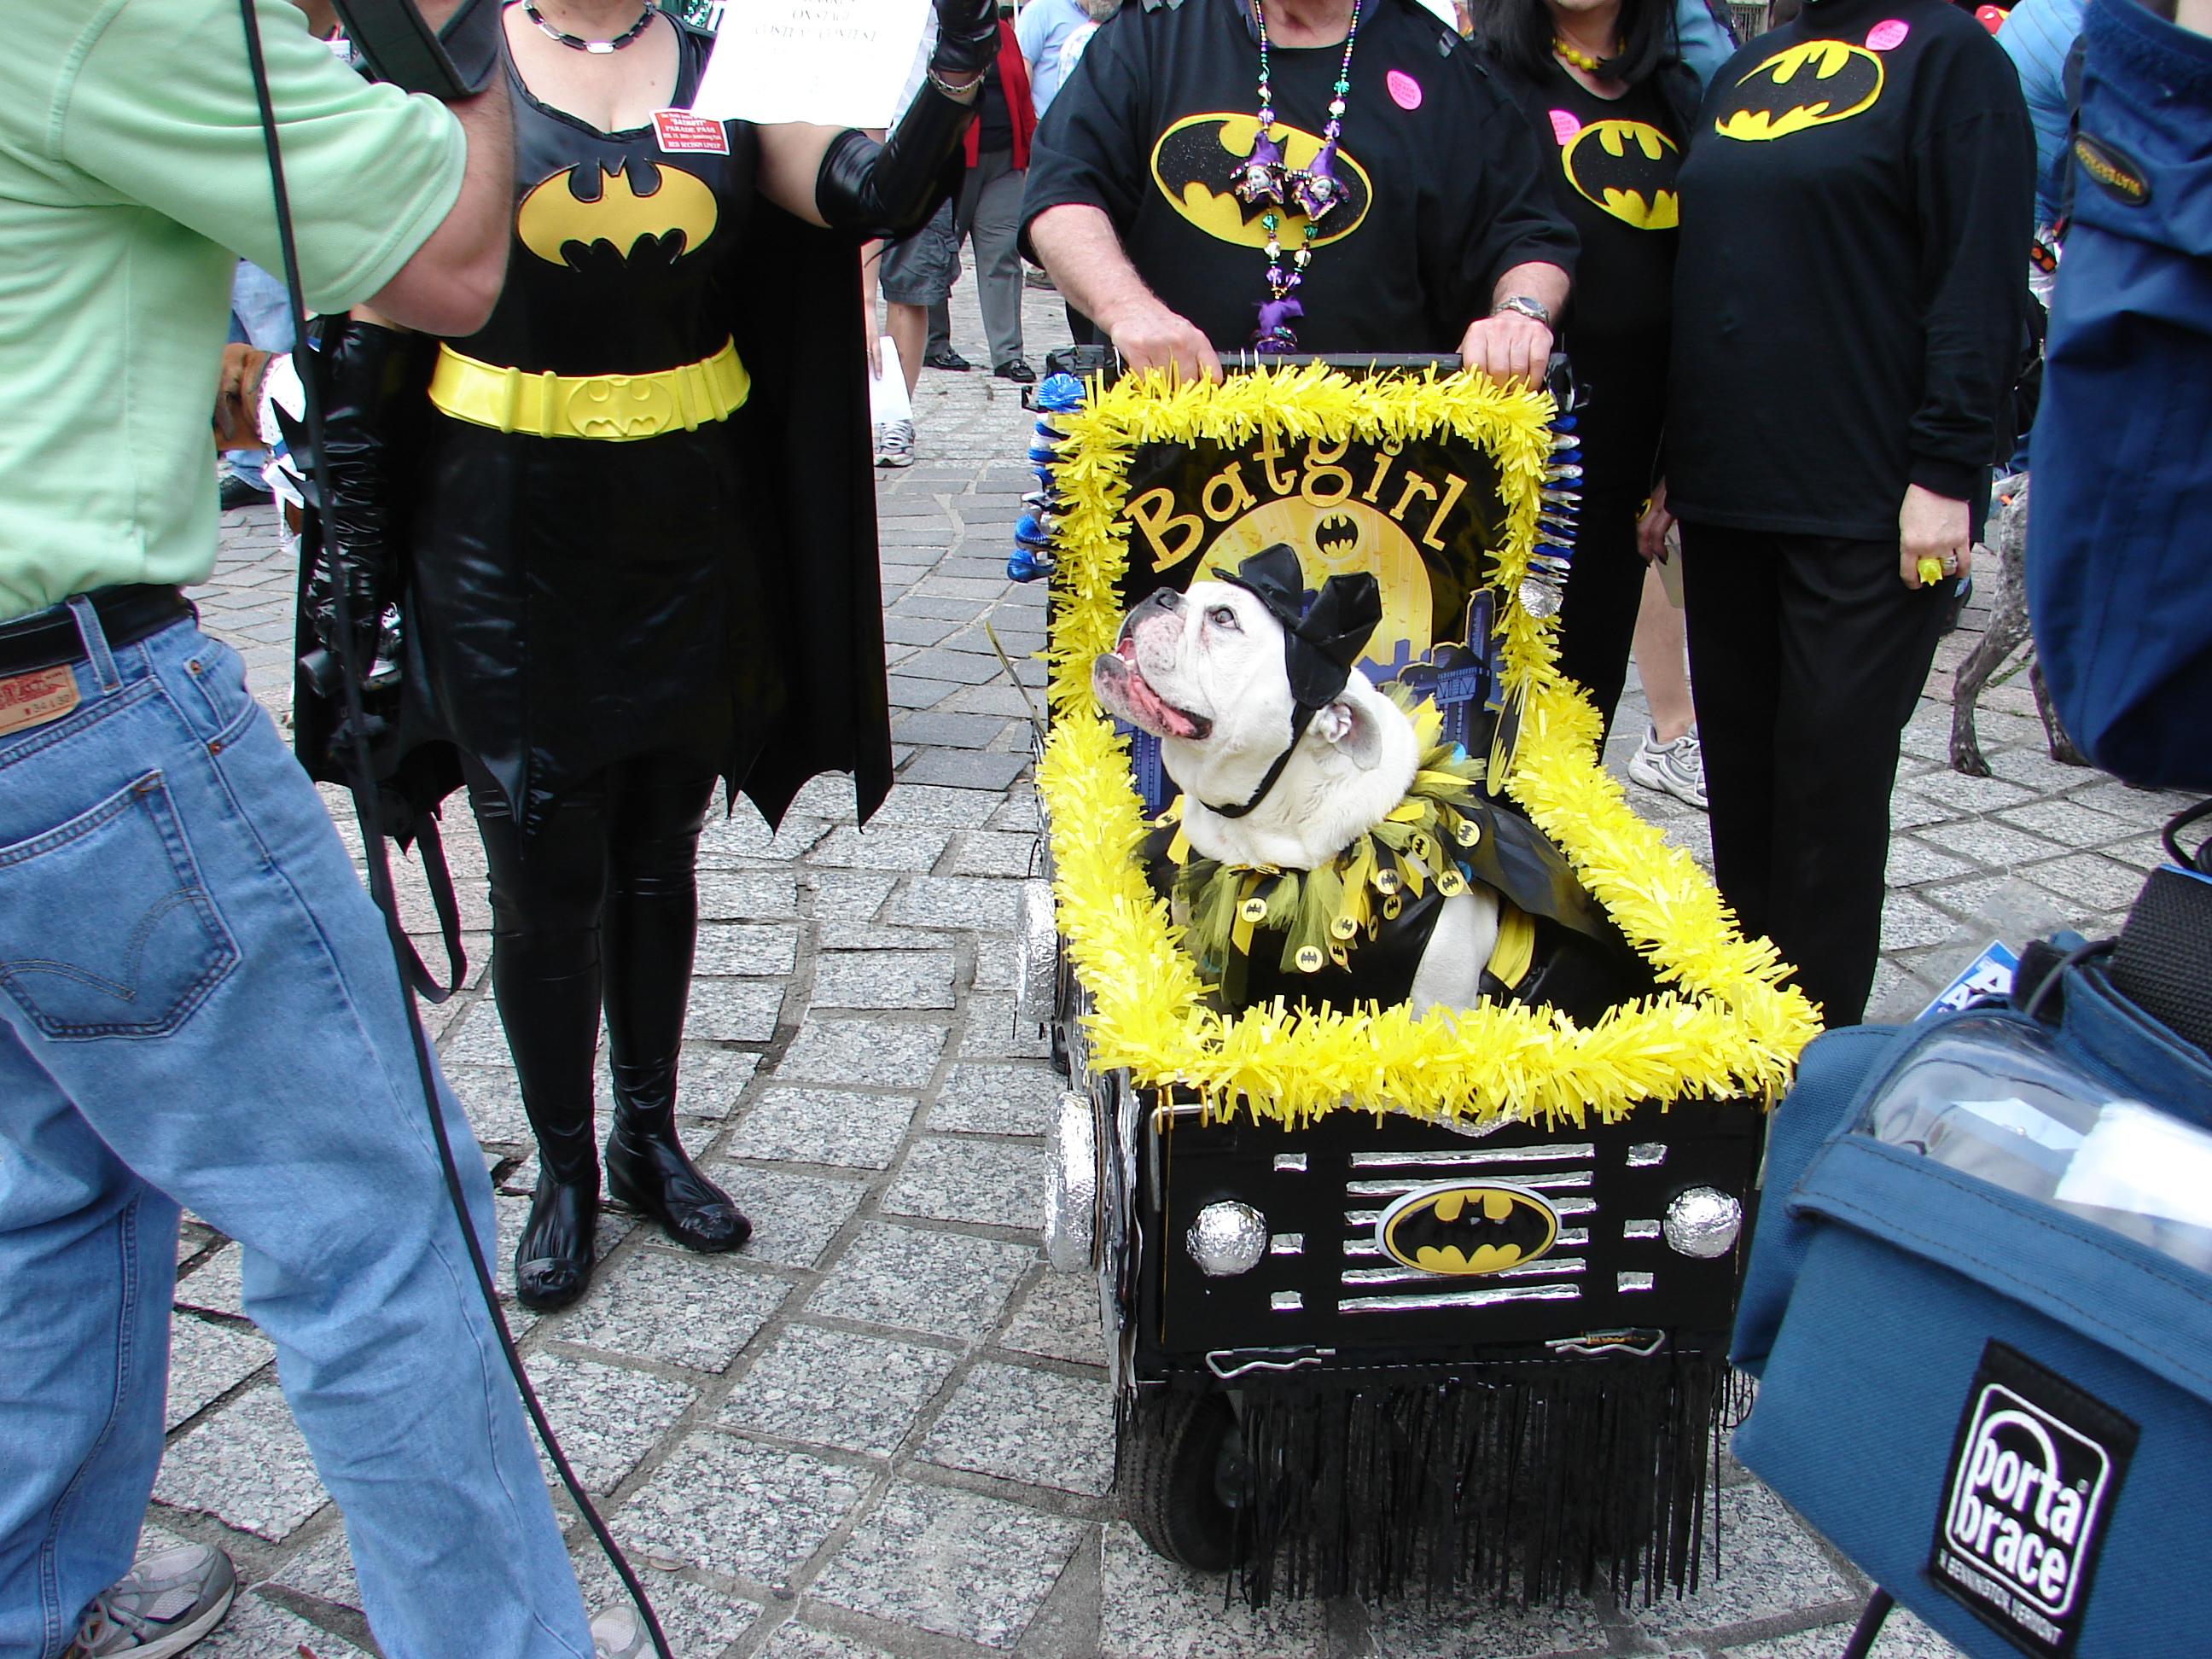 File:Barkus 2009 - New Orleans Dog Parade 02.jpg